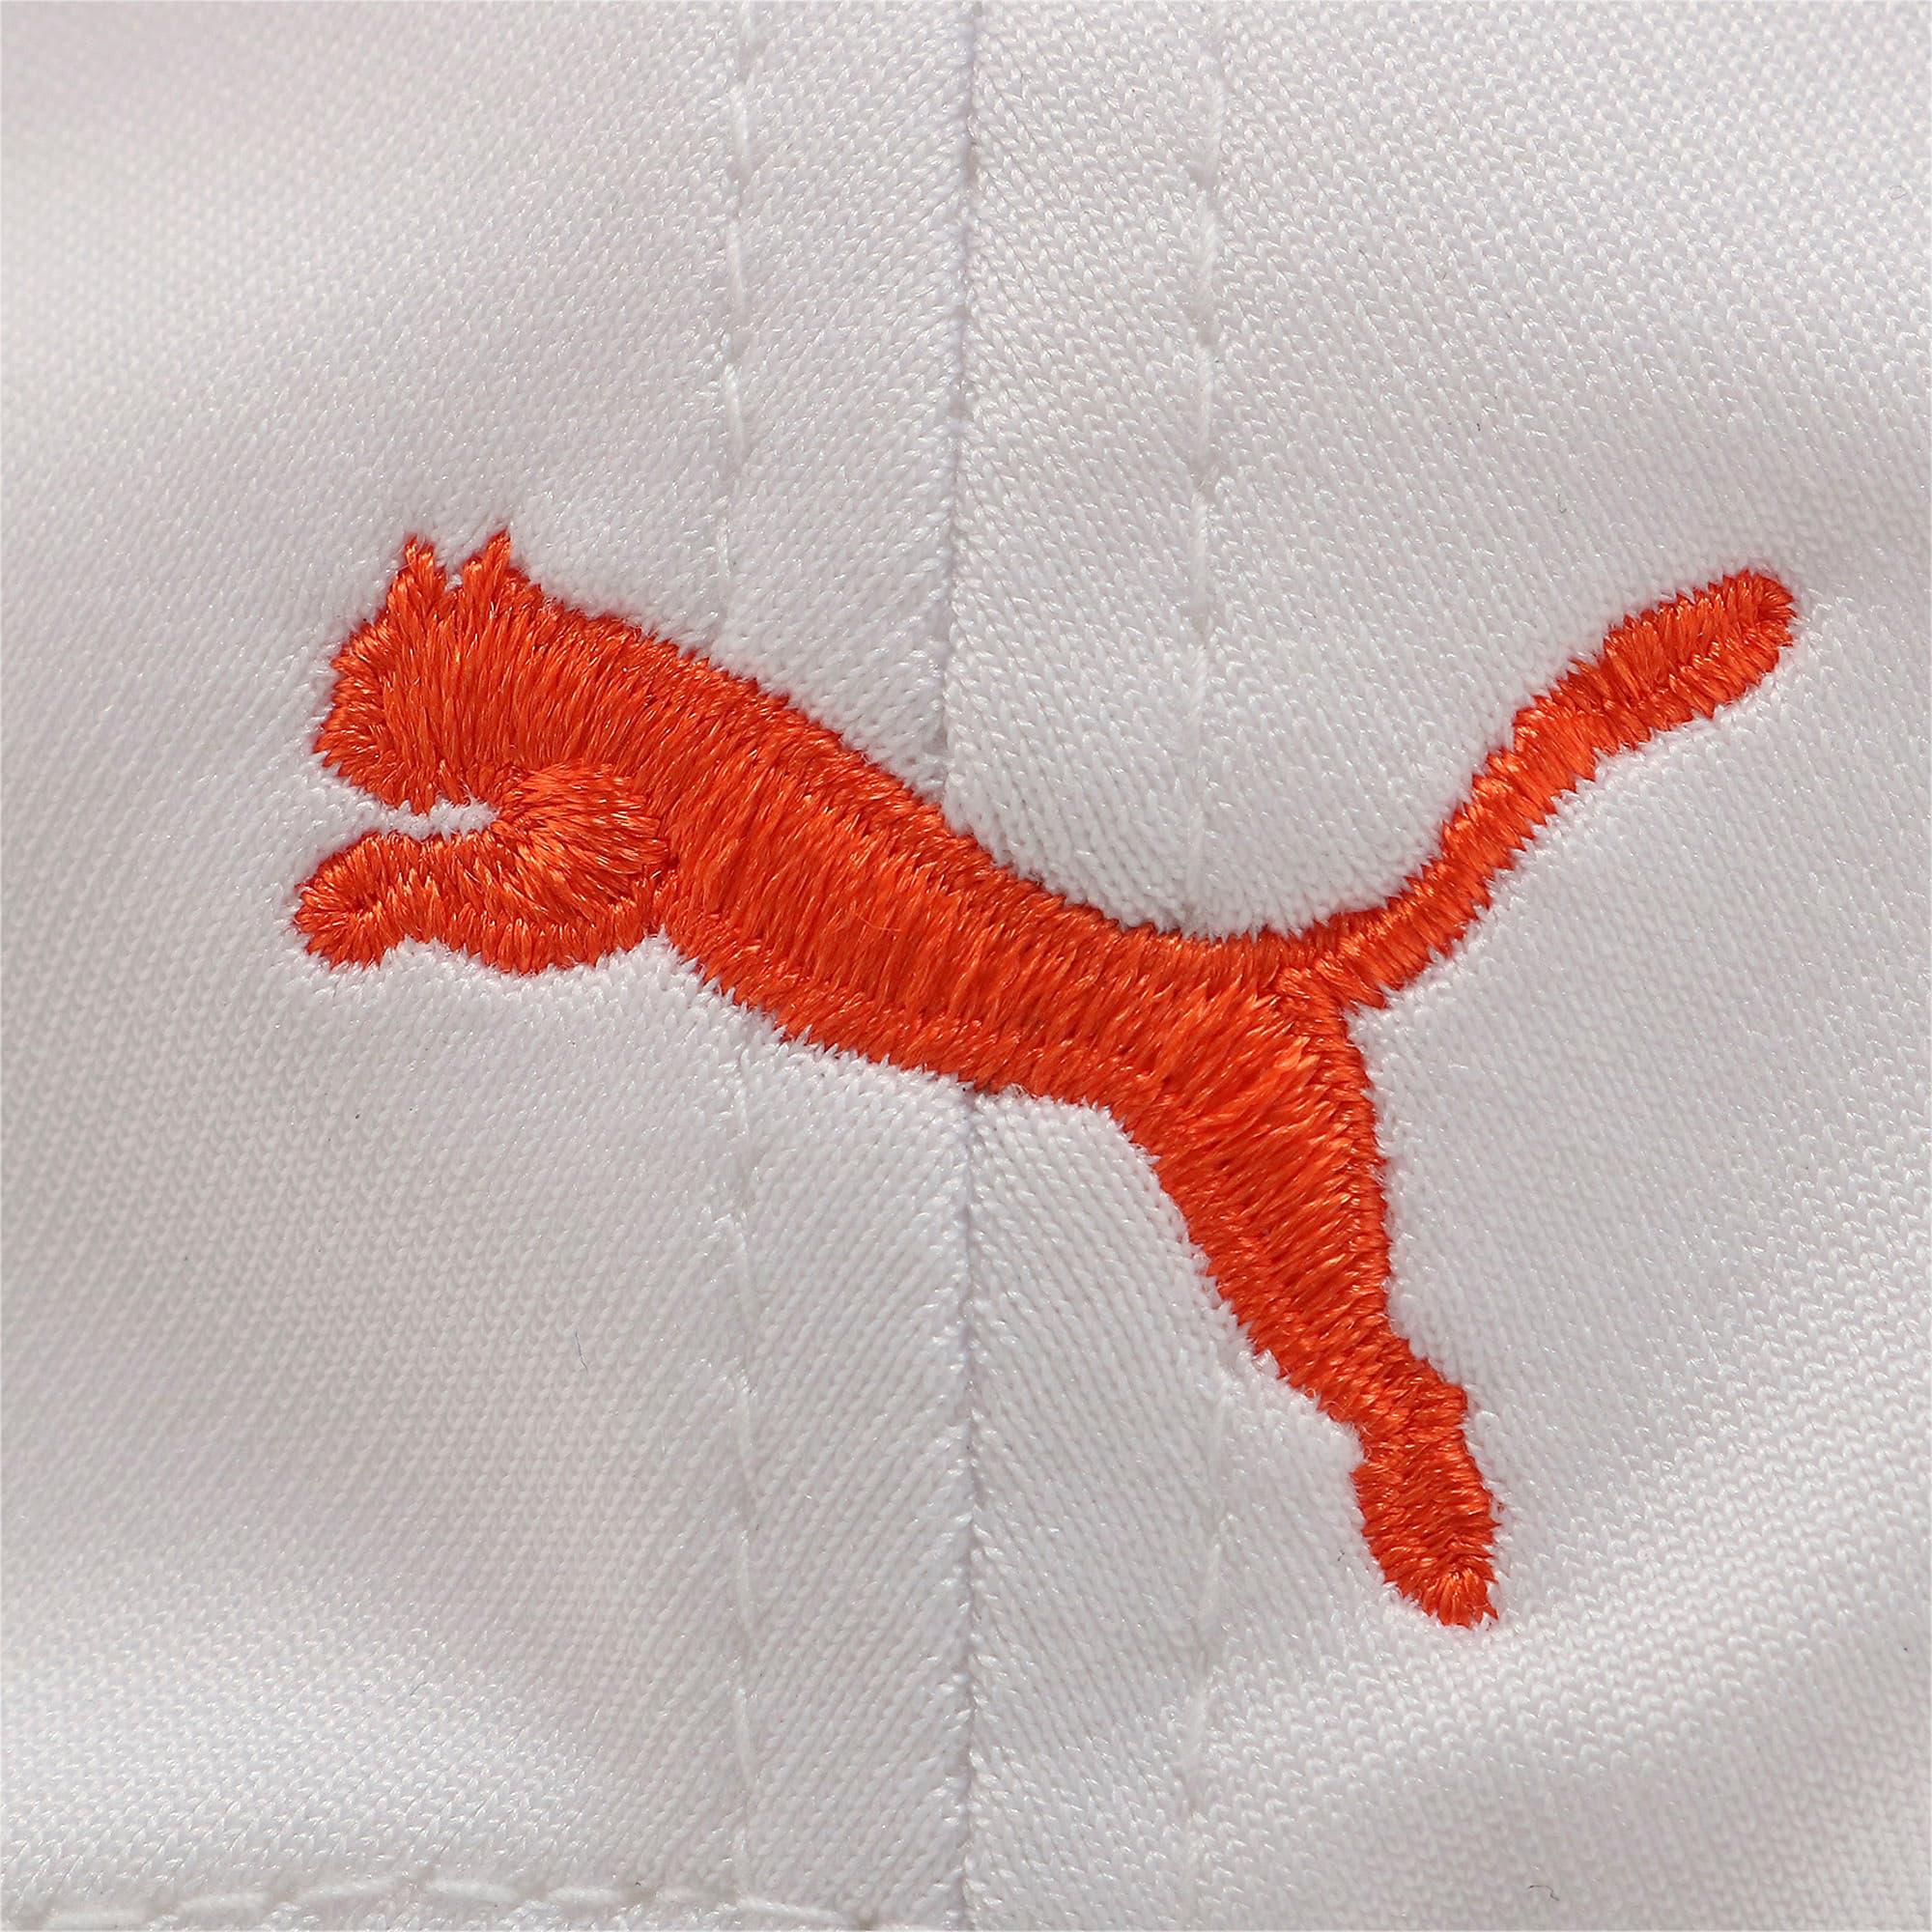 Thumbnail 4 of ゴルフ Pマークスナップバックキャップ, Bright White-Vibrant Orange, medium-JPN